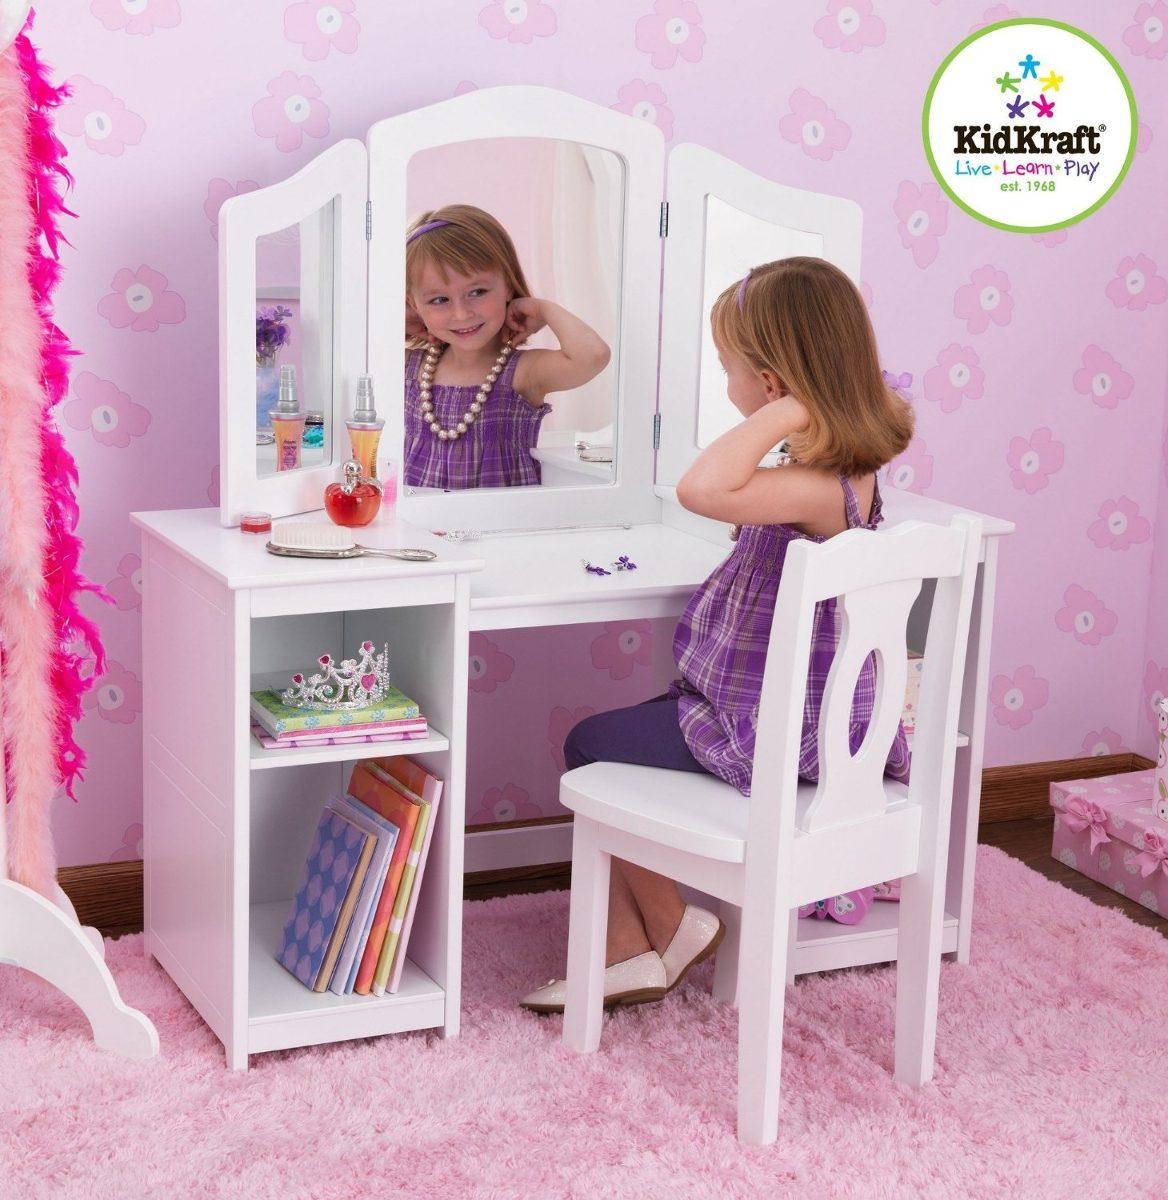 Peinador Tocador Para Ni As Kidkraft De Madera Incluye Silla  # Muebles Peinadores De Madera